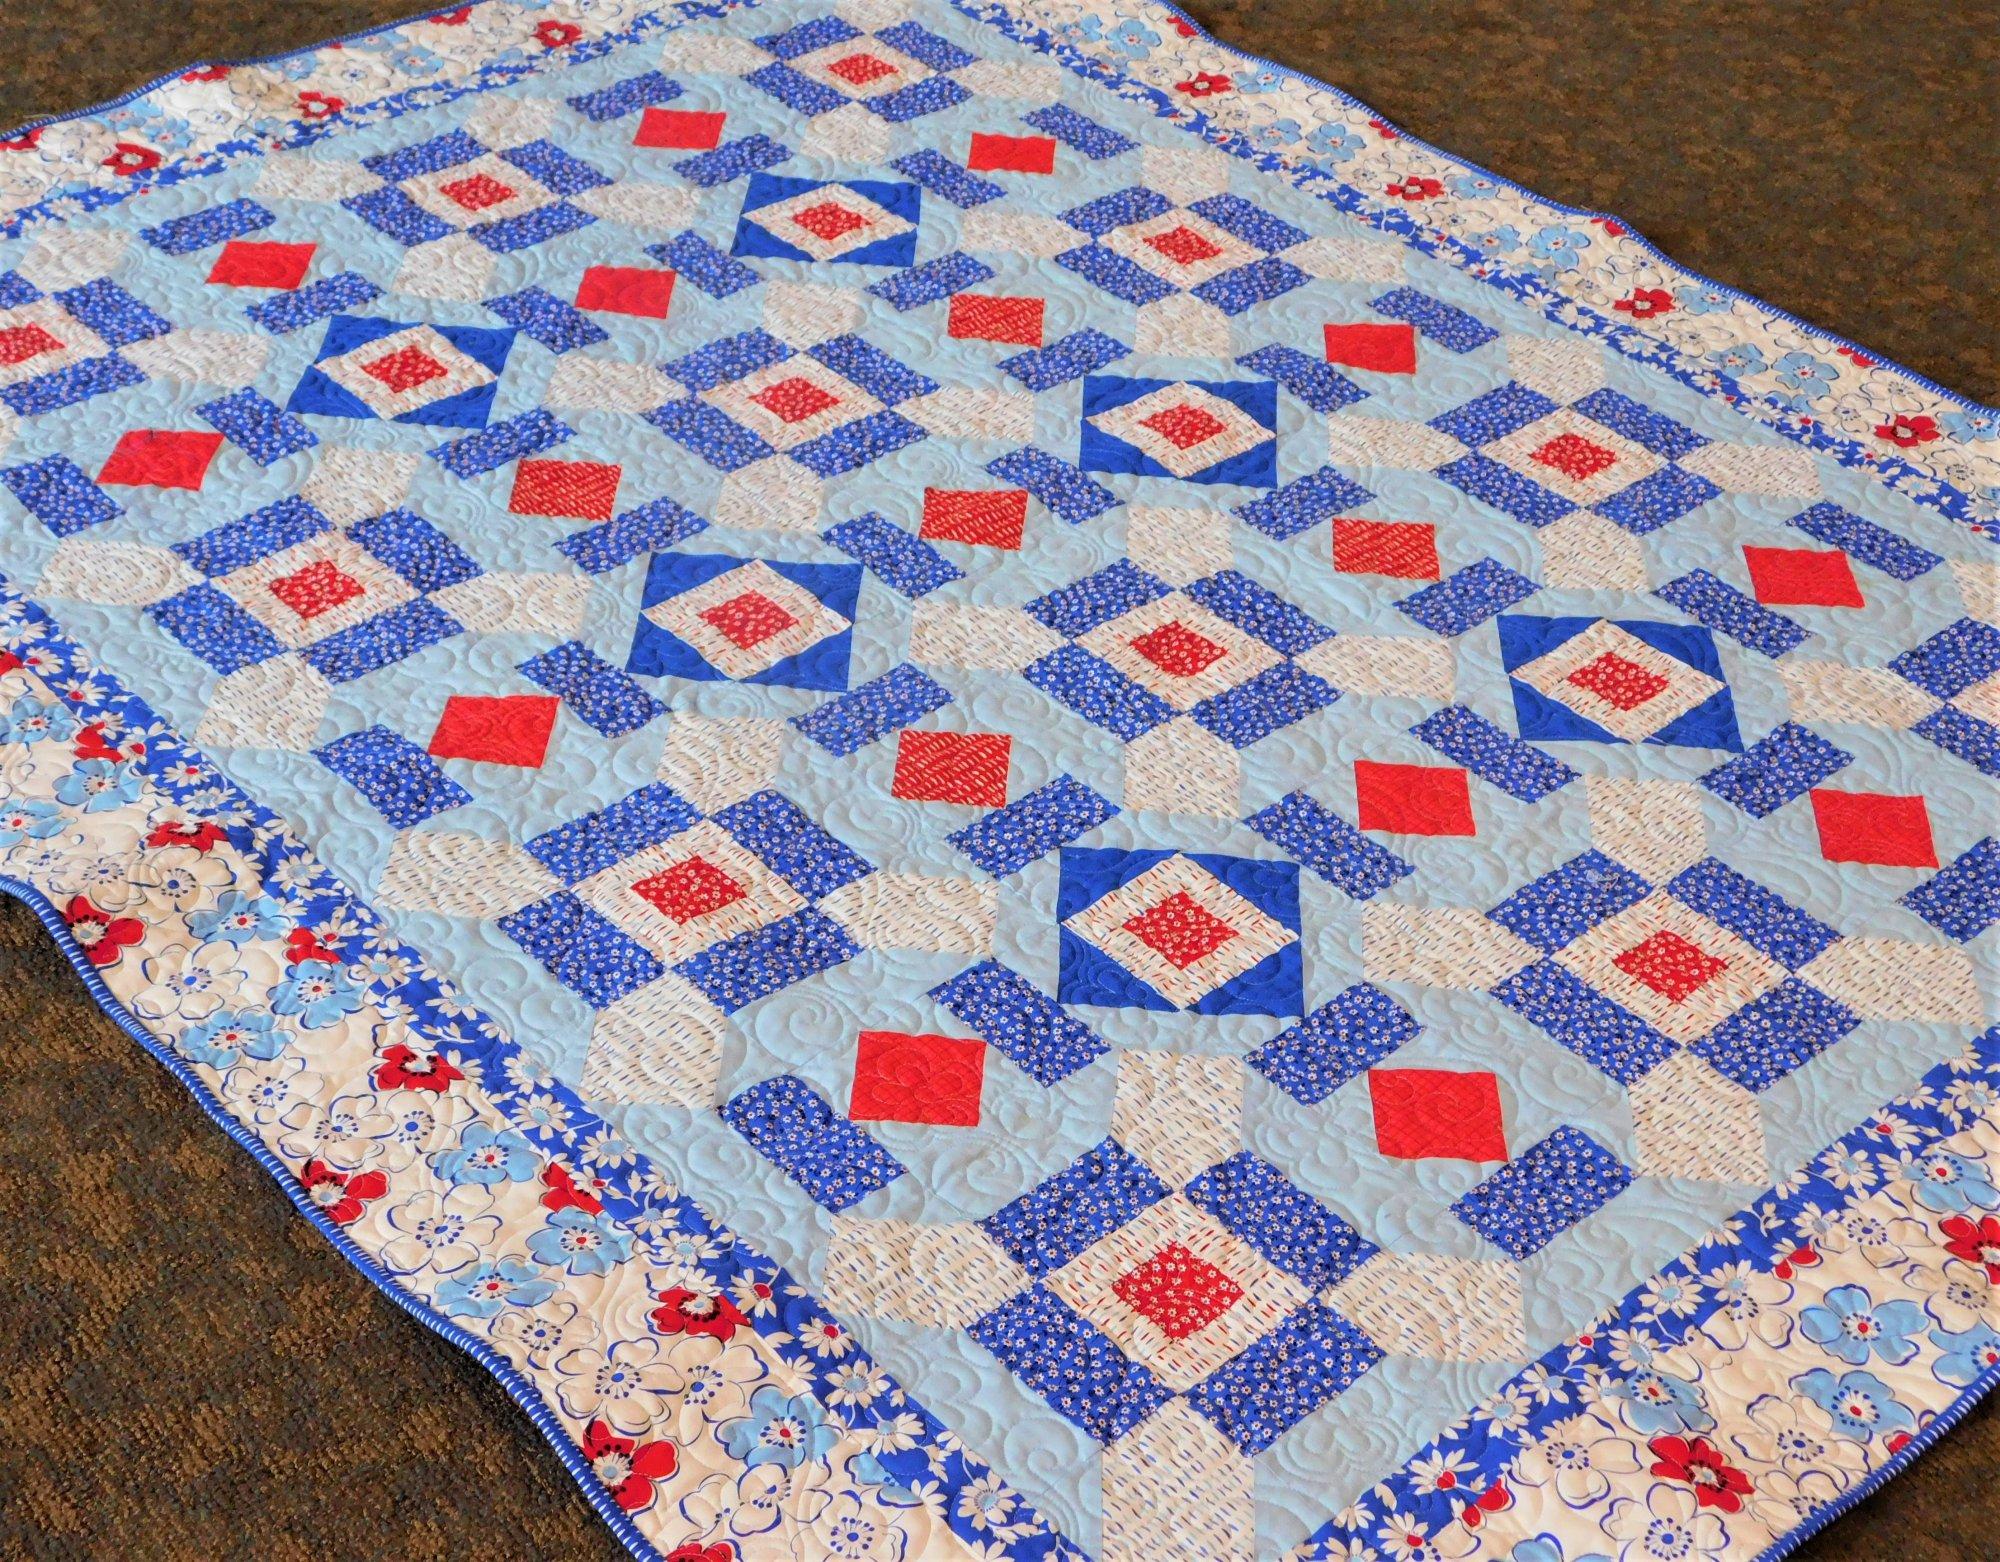 Red Diamonds Quilt Kit - 56 1/2 X 72 1/2